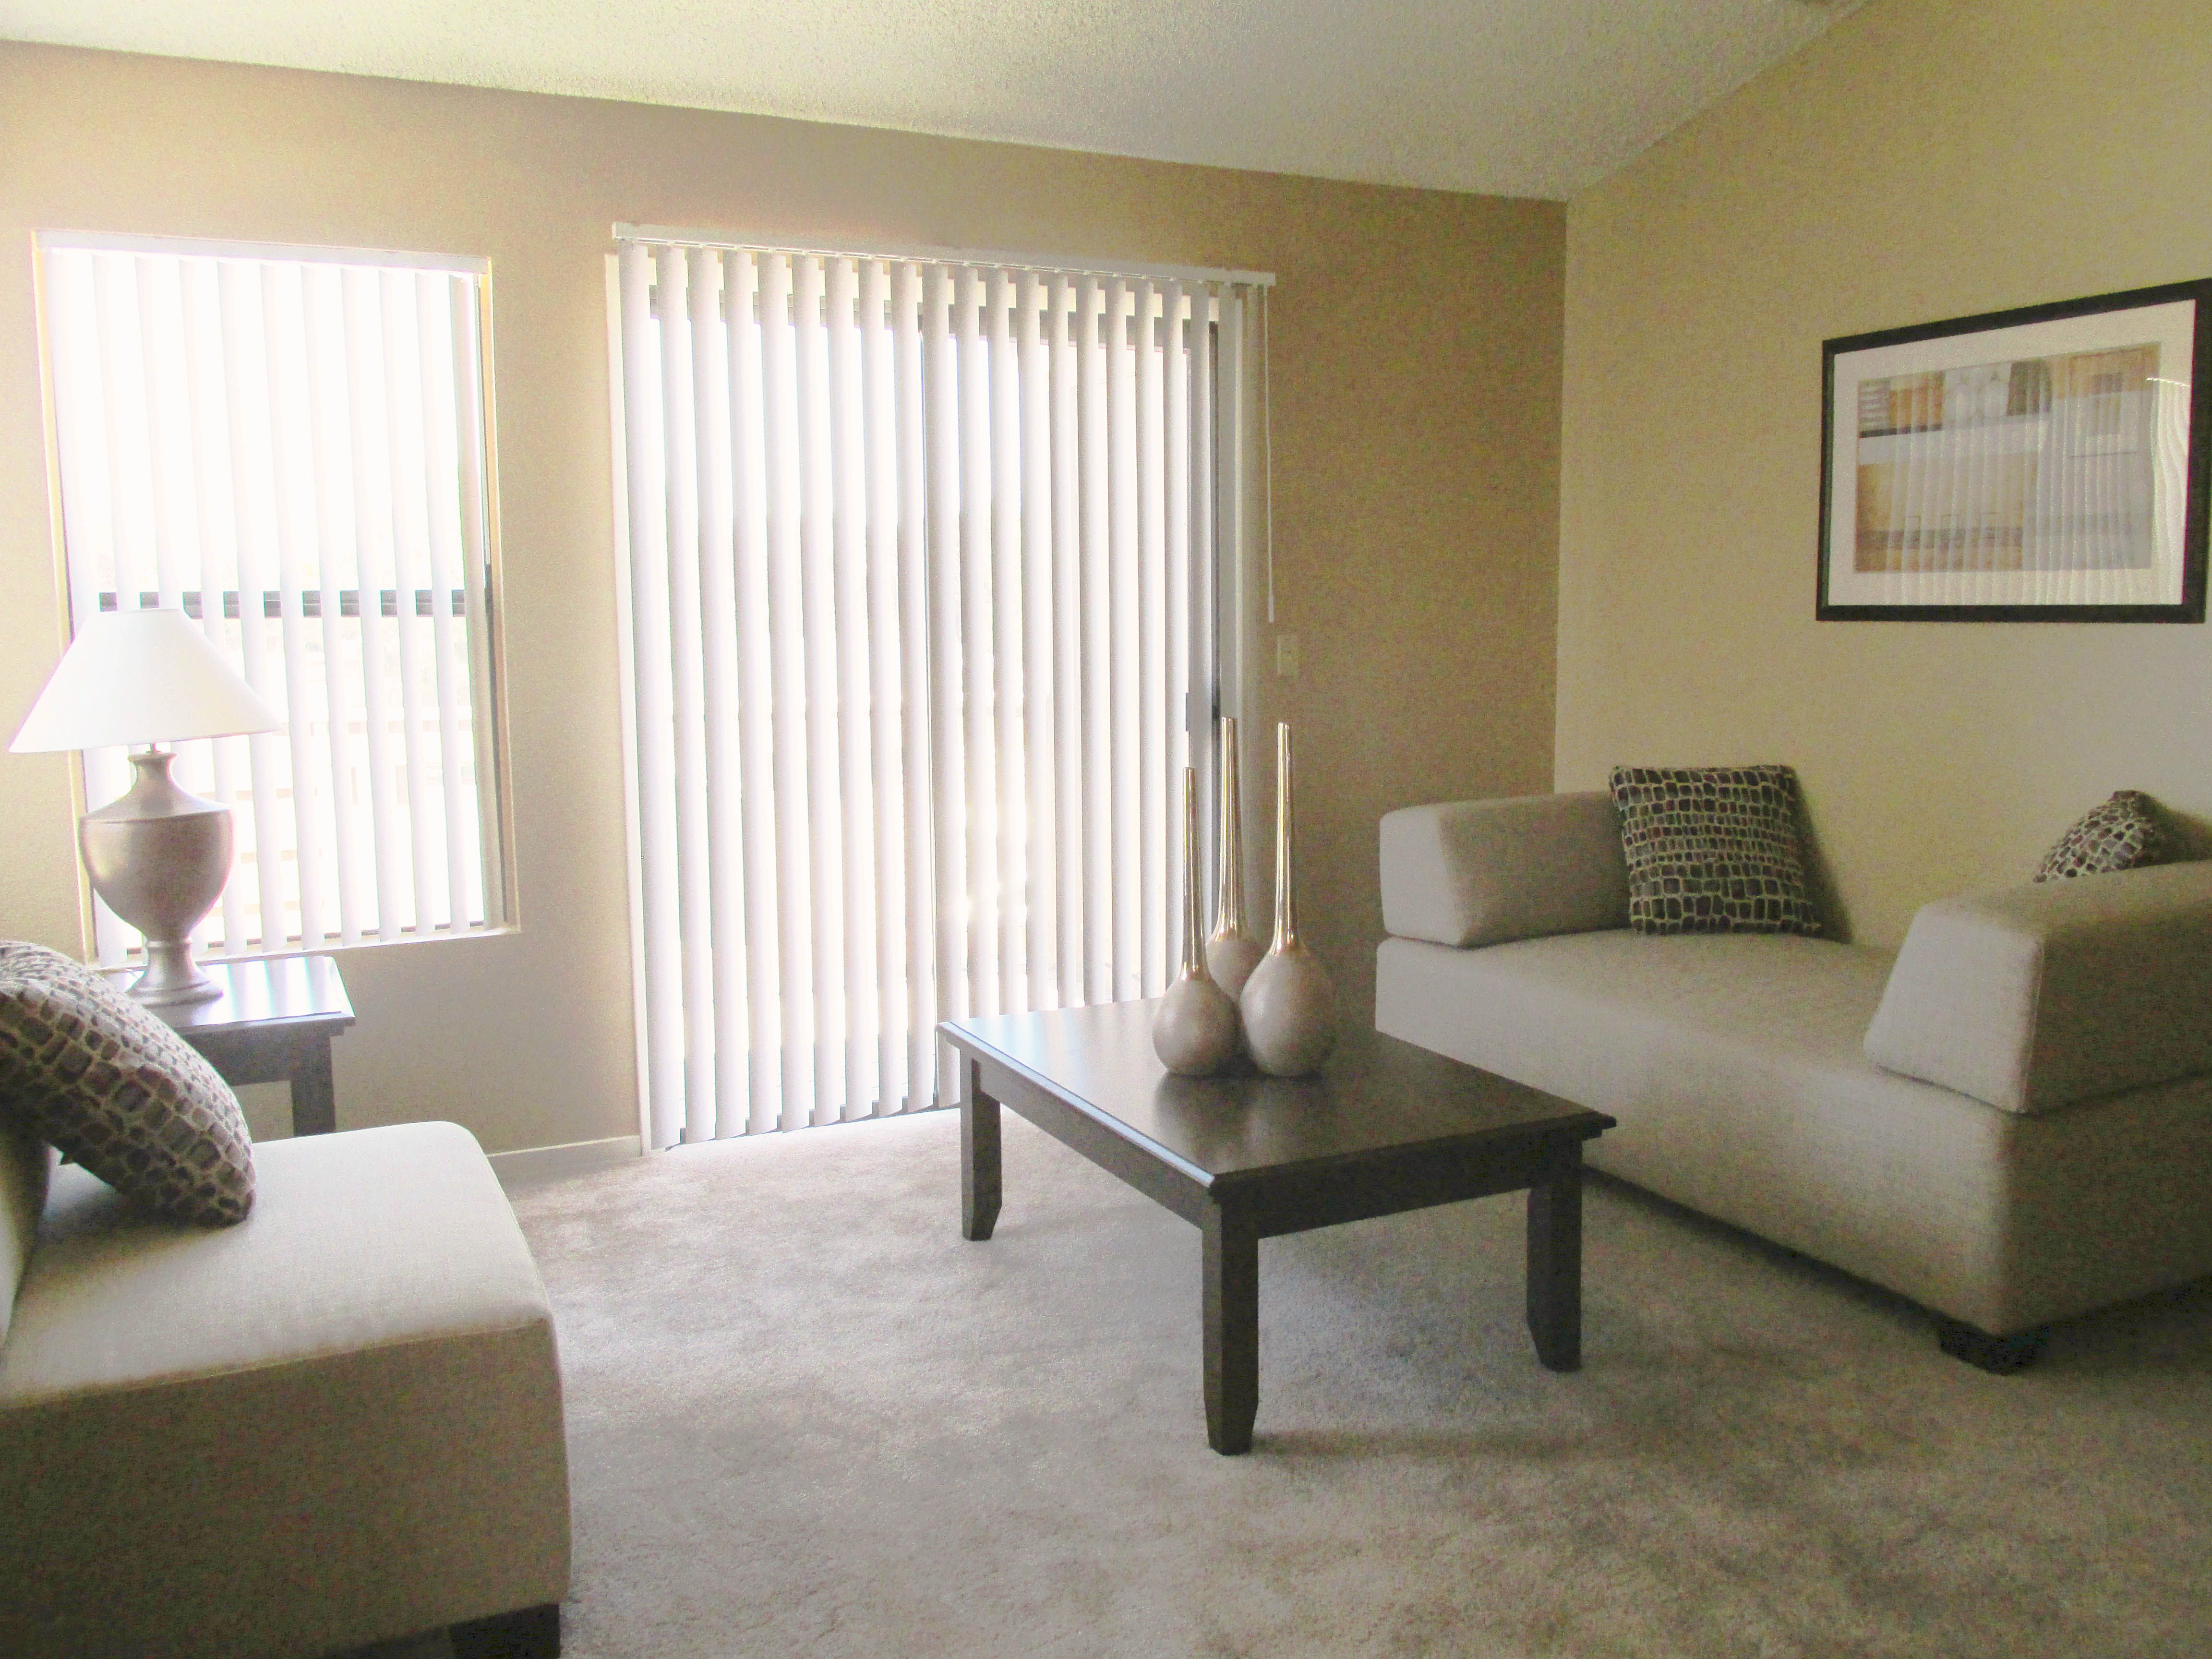 Bristle Pointe Apartments   Reno, NV #Apartments #apartmentliving